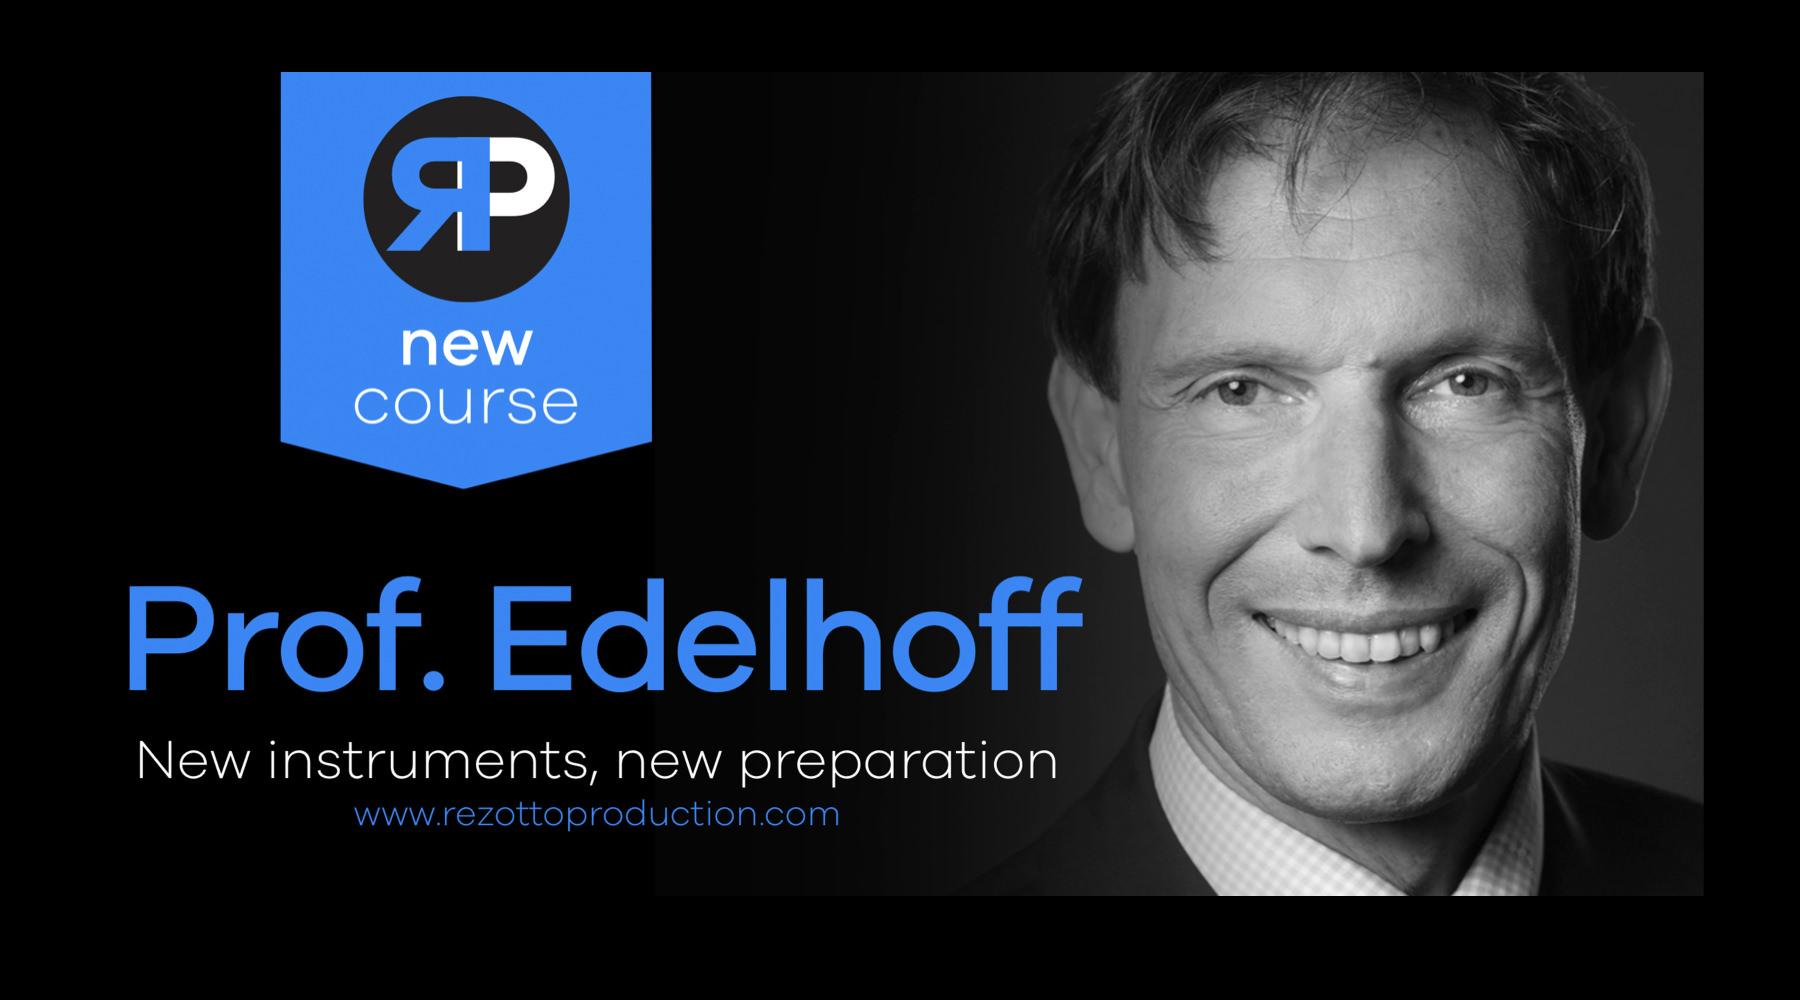 Prof. Edelhoff